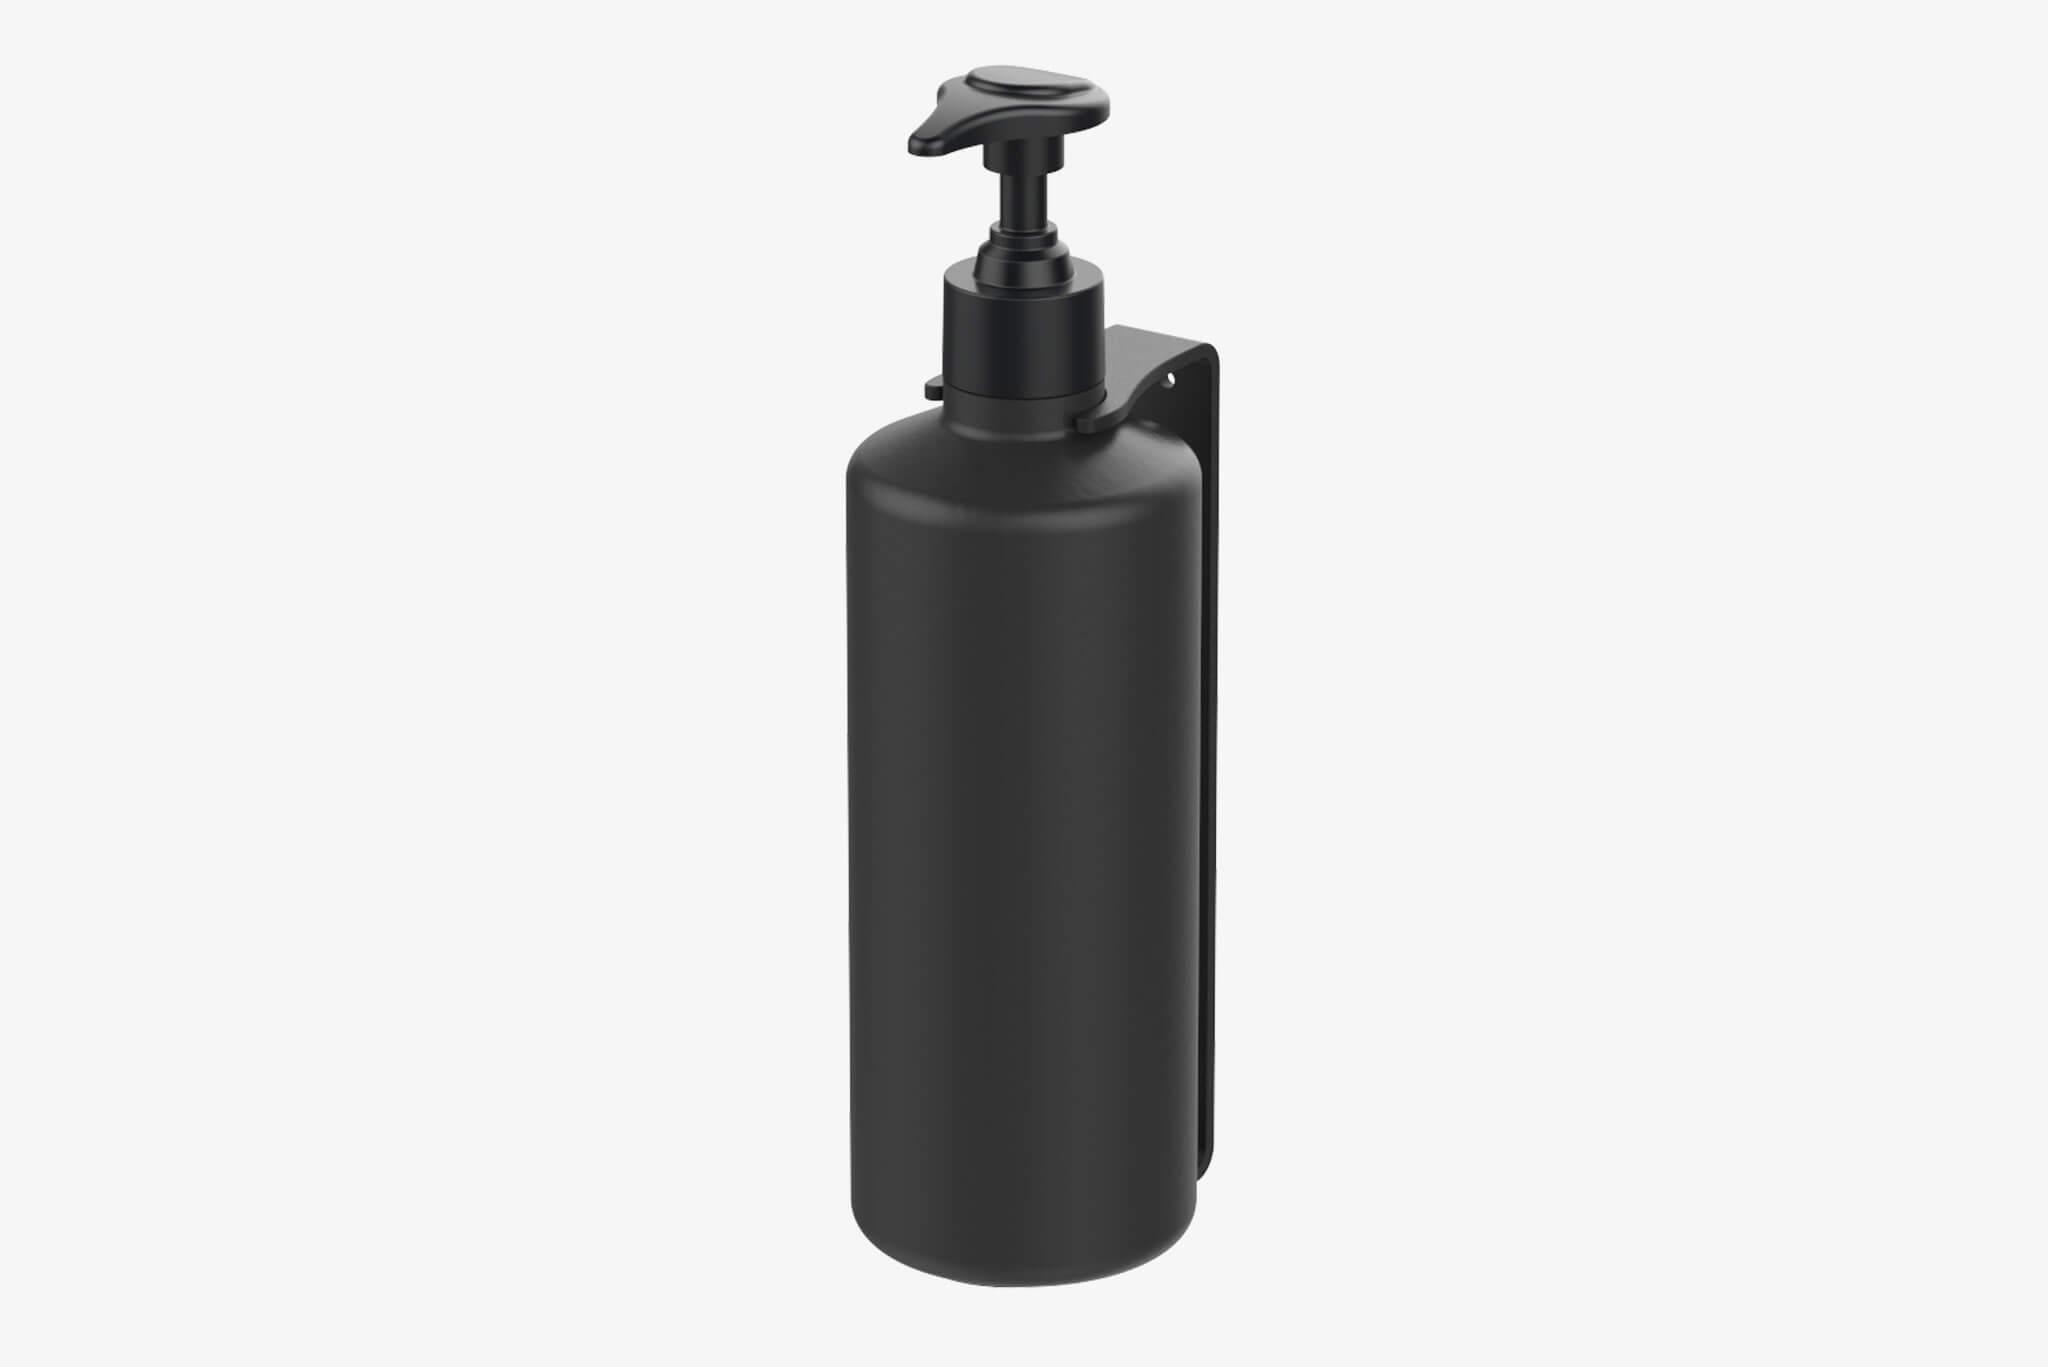 Bottle Holder Snap (ID.992)